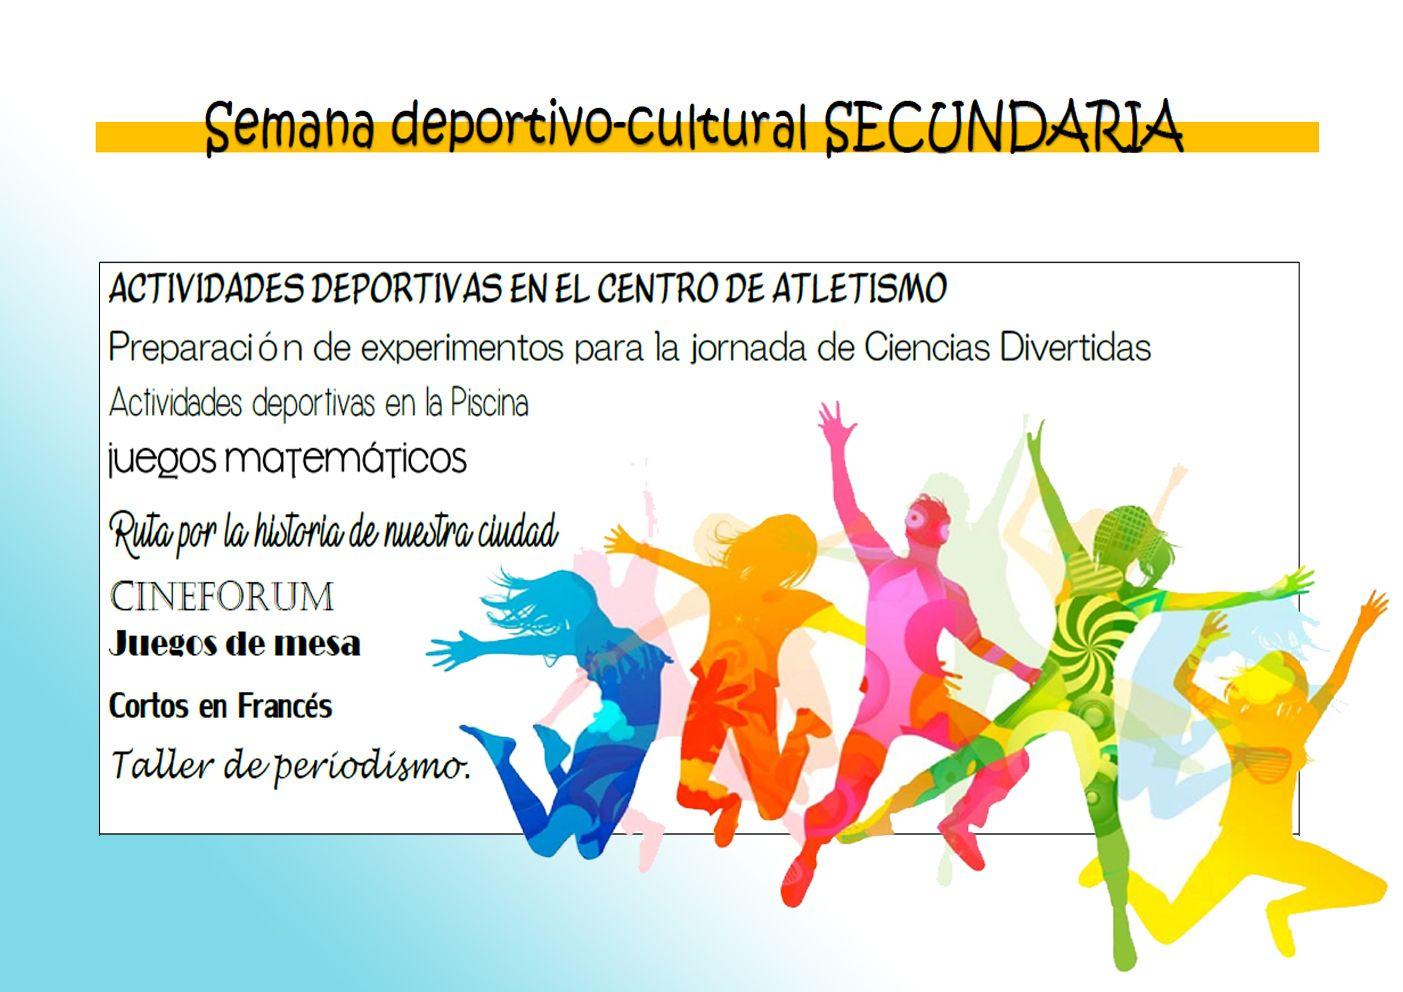 SEMANA DEPORTIVO-CULTURAL SECUNDARIA